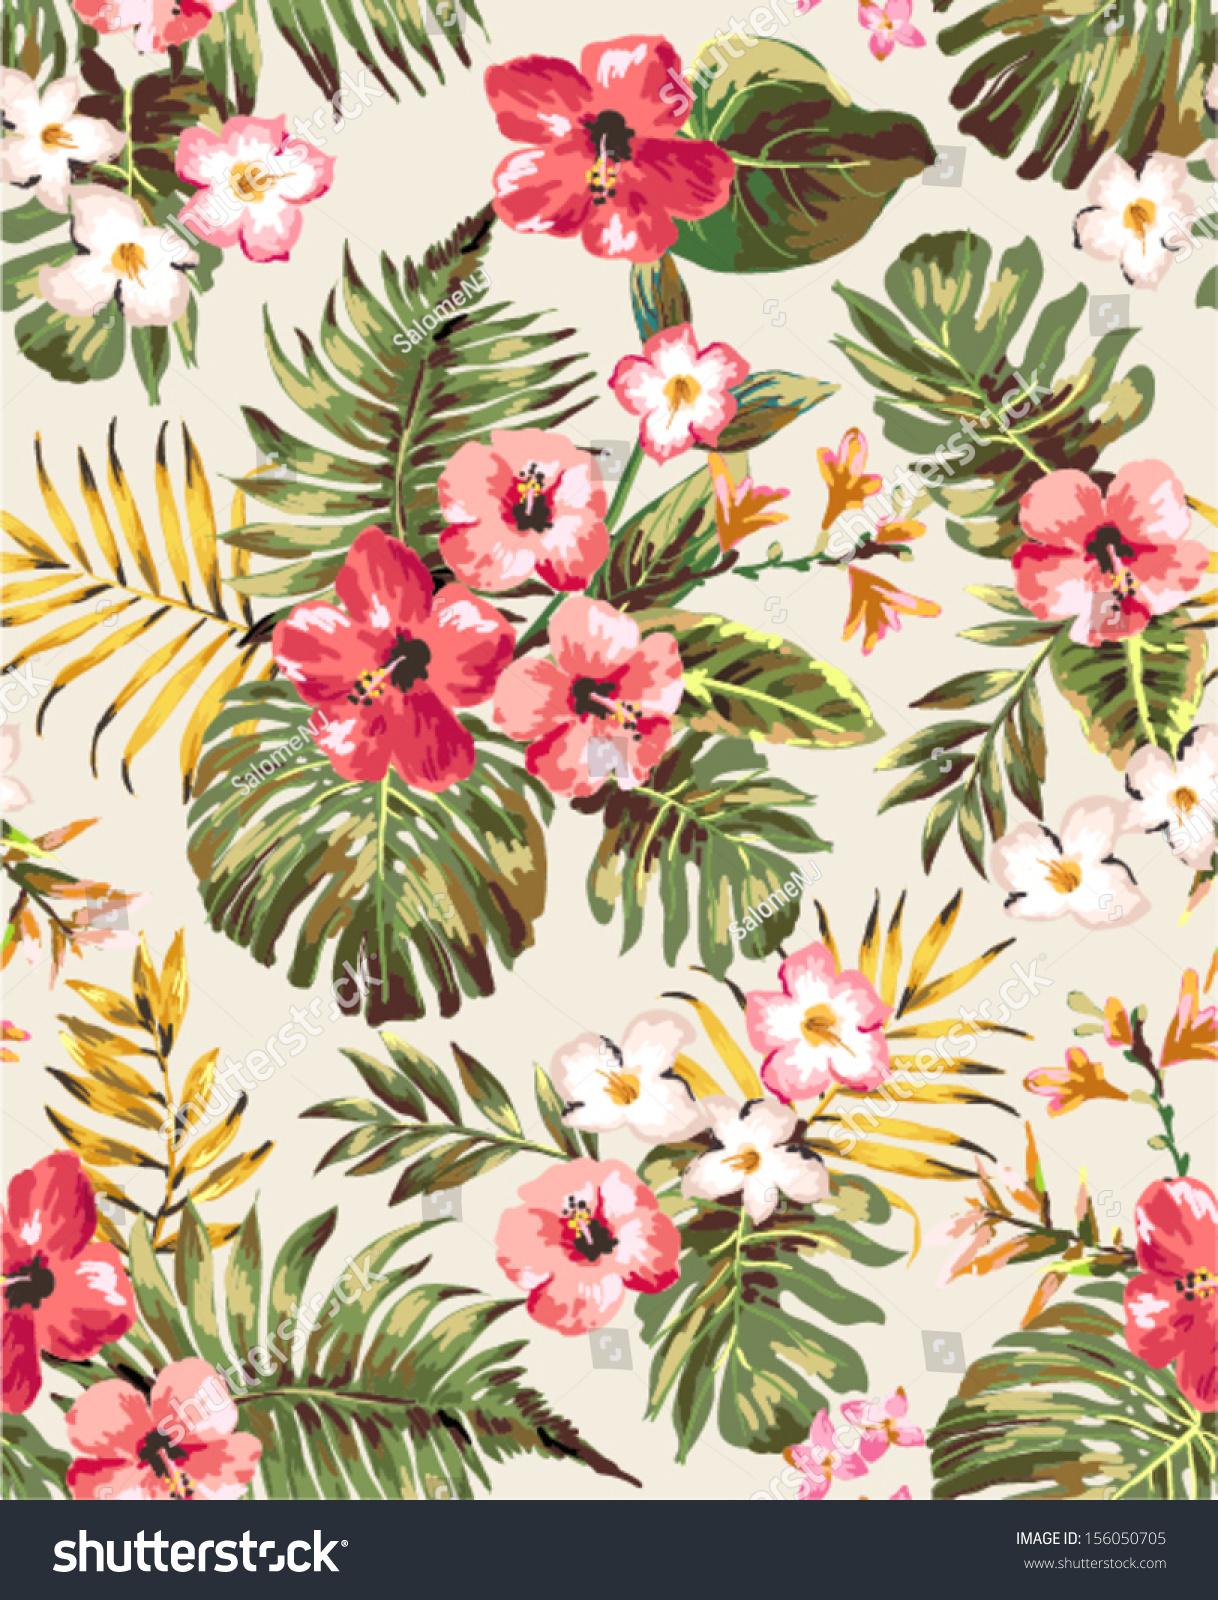 Fashion High Quality Cotton Linen Tropical plant Flowers